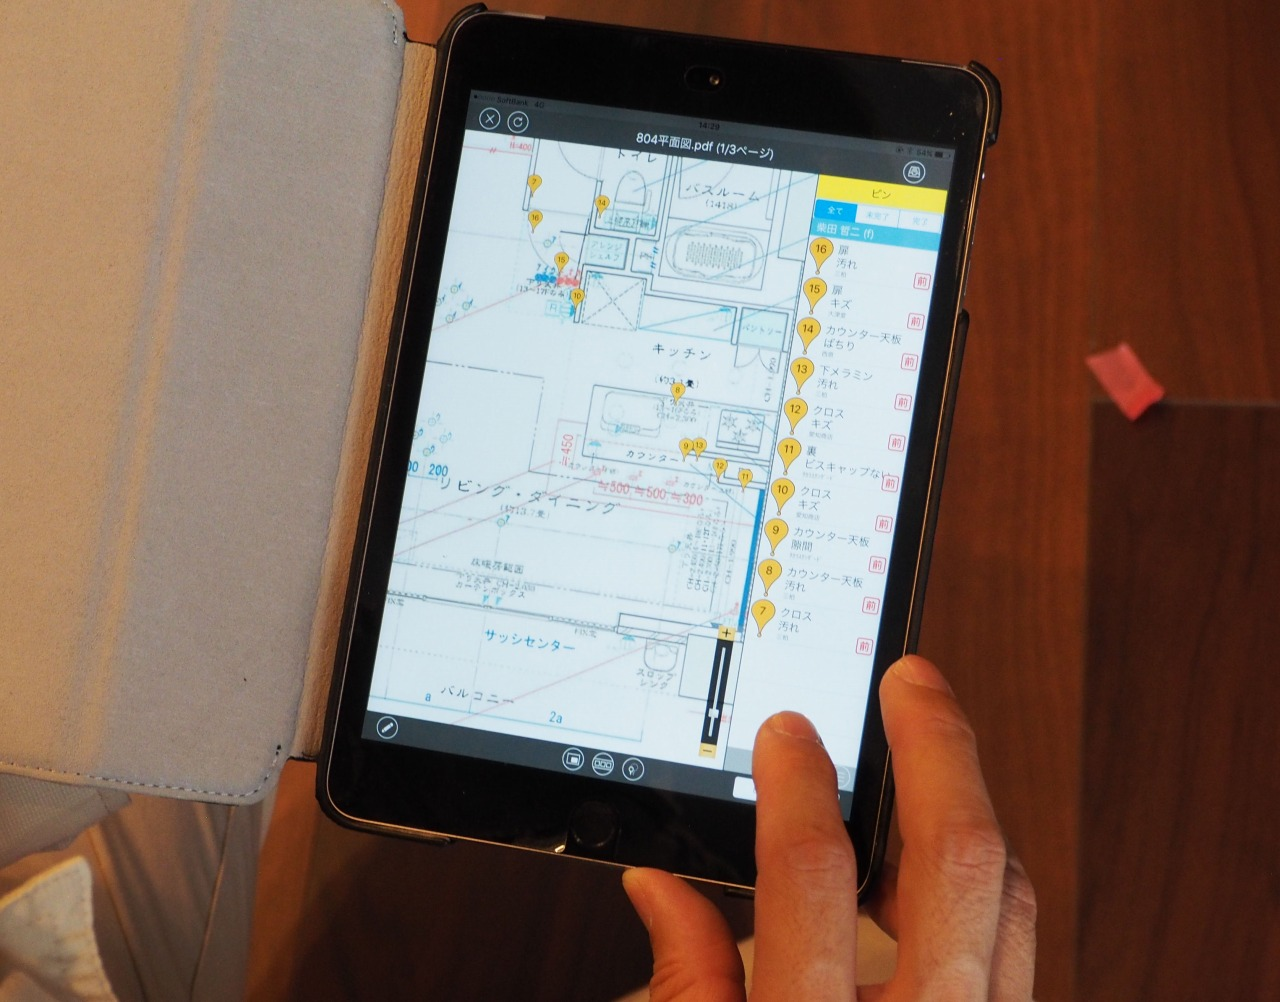 iPadによる仕上げ検査。表示された図面上に不具合個所を示す「ピン」を立てていく